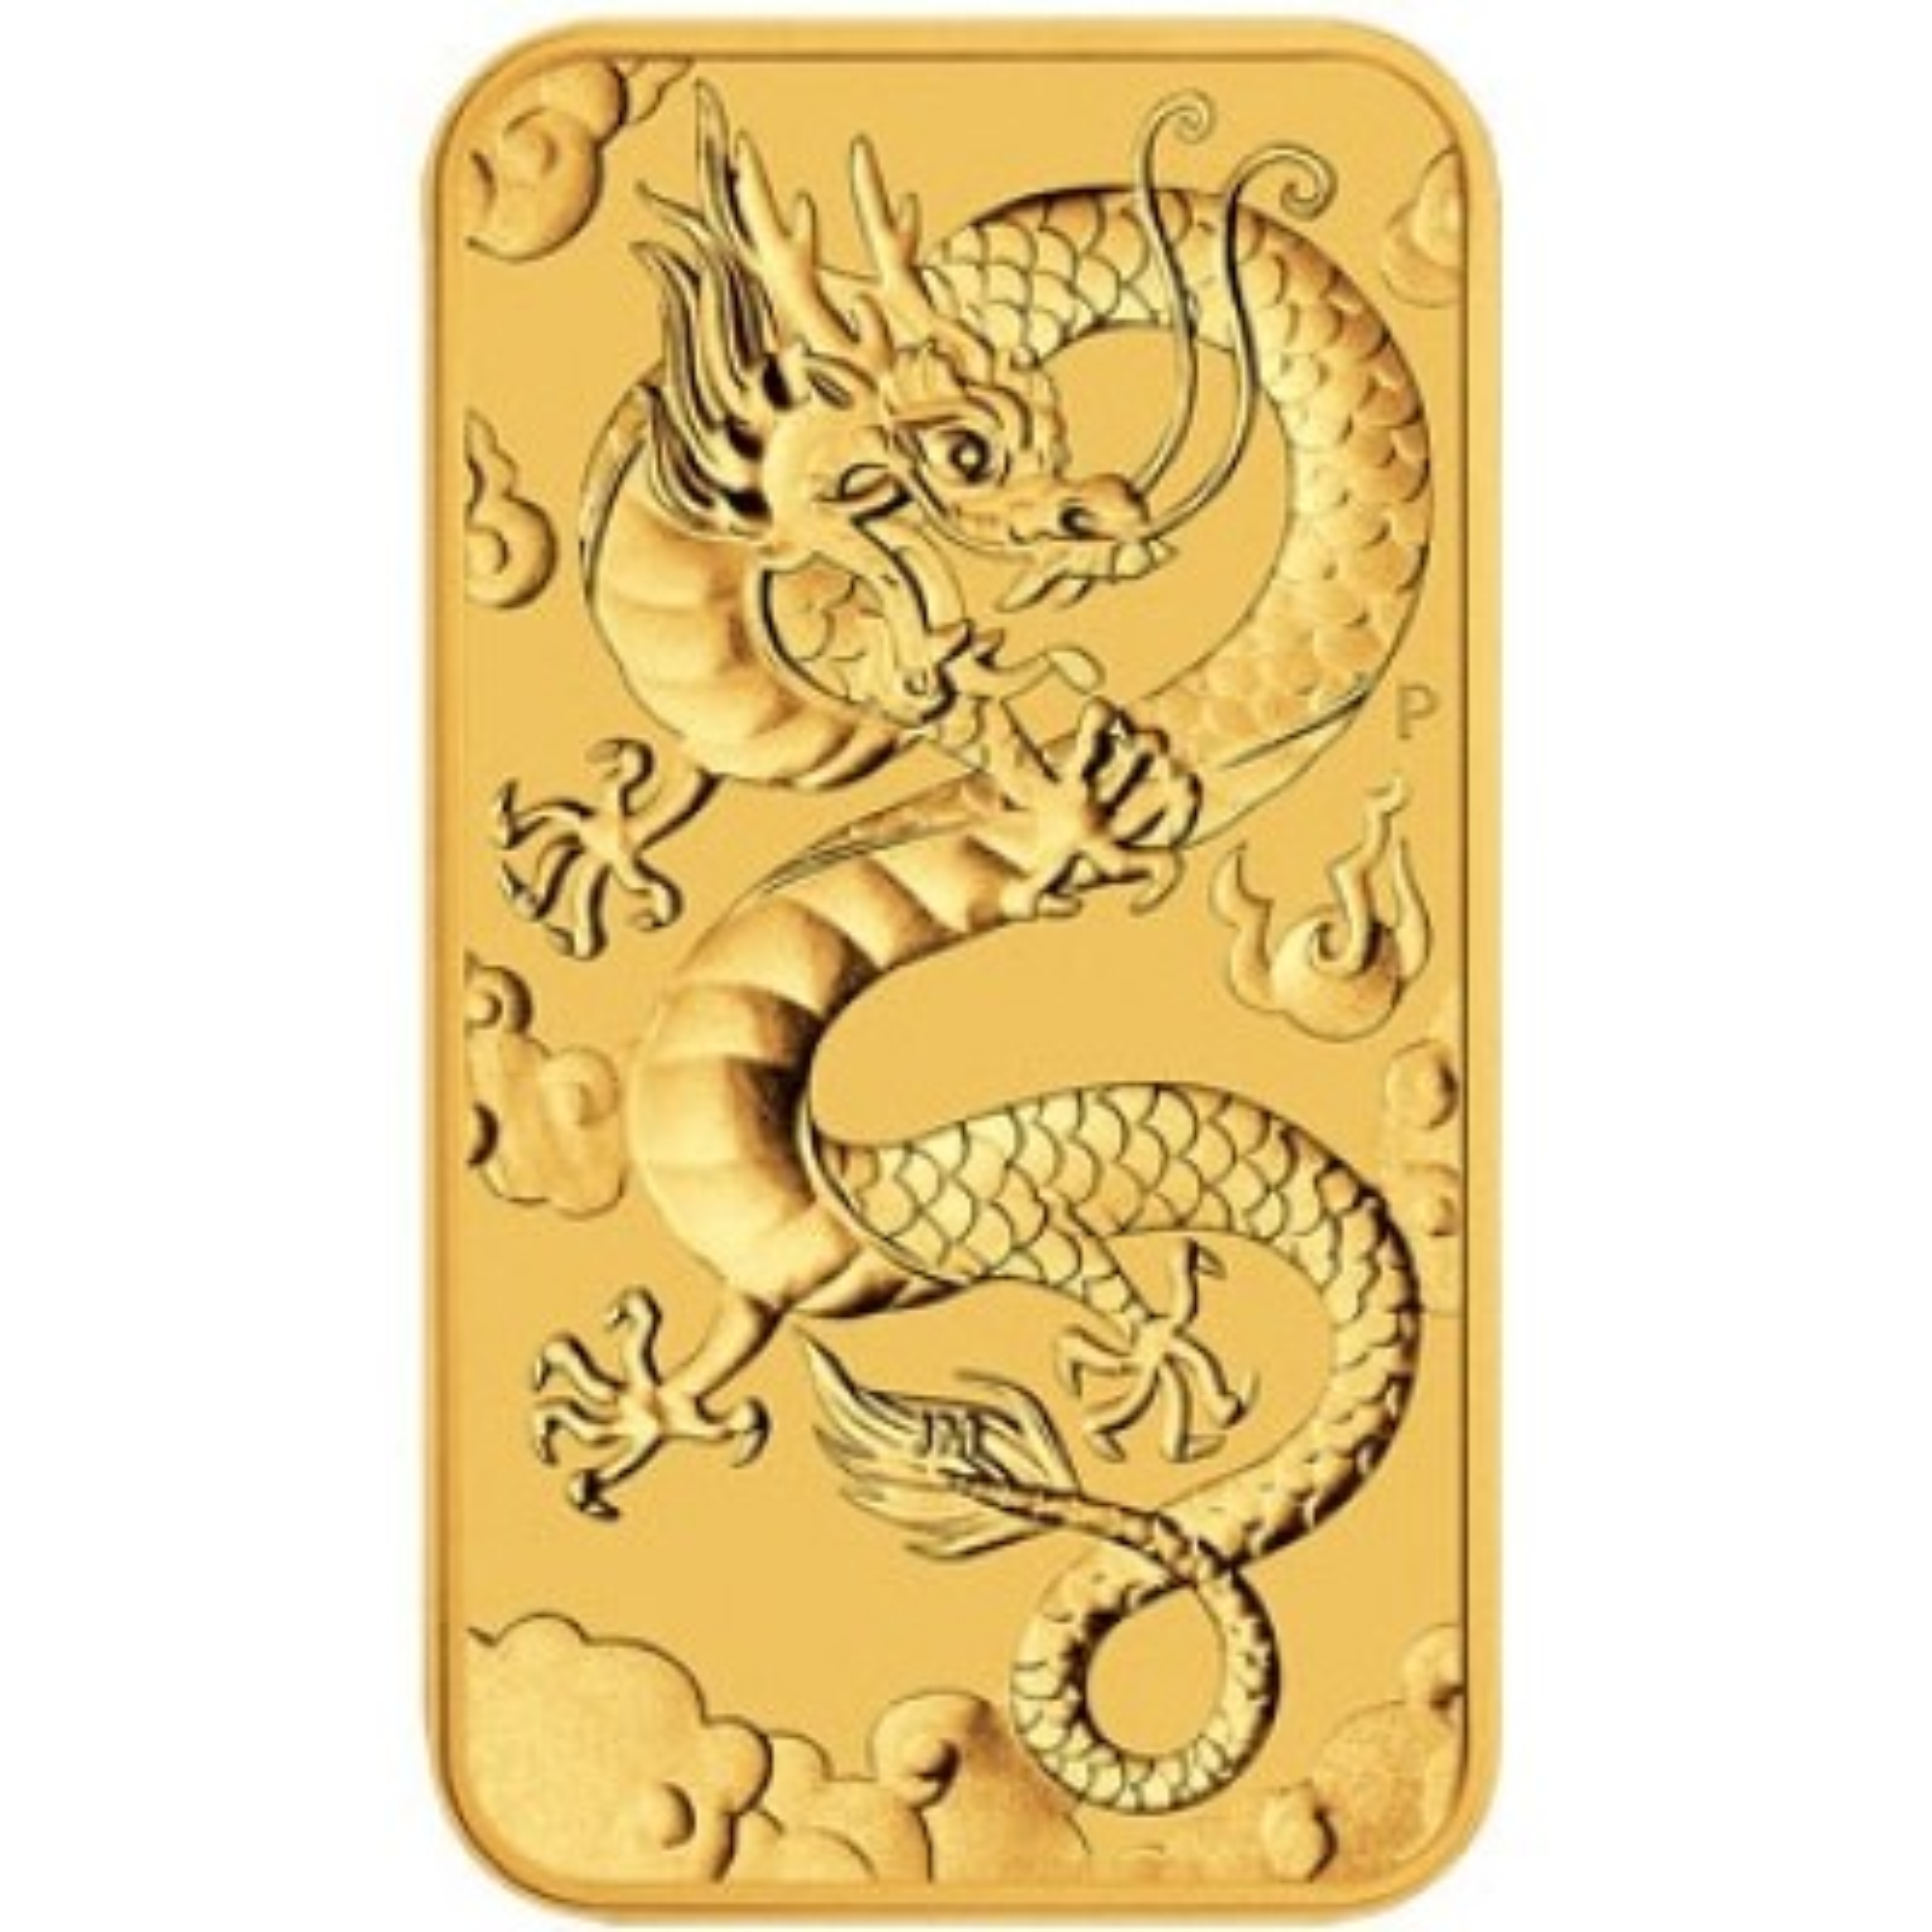 1 Troy ounce gold coin bar Rectangular Dragon 2019